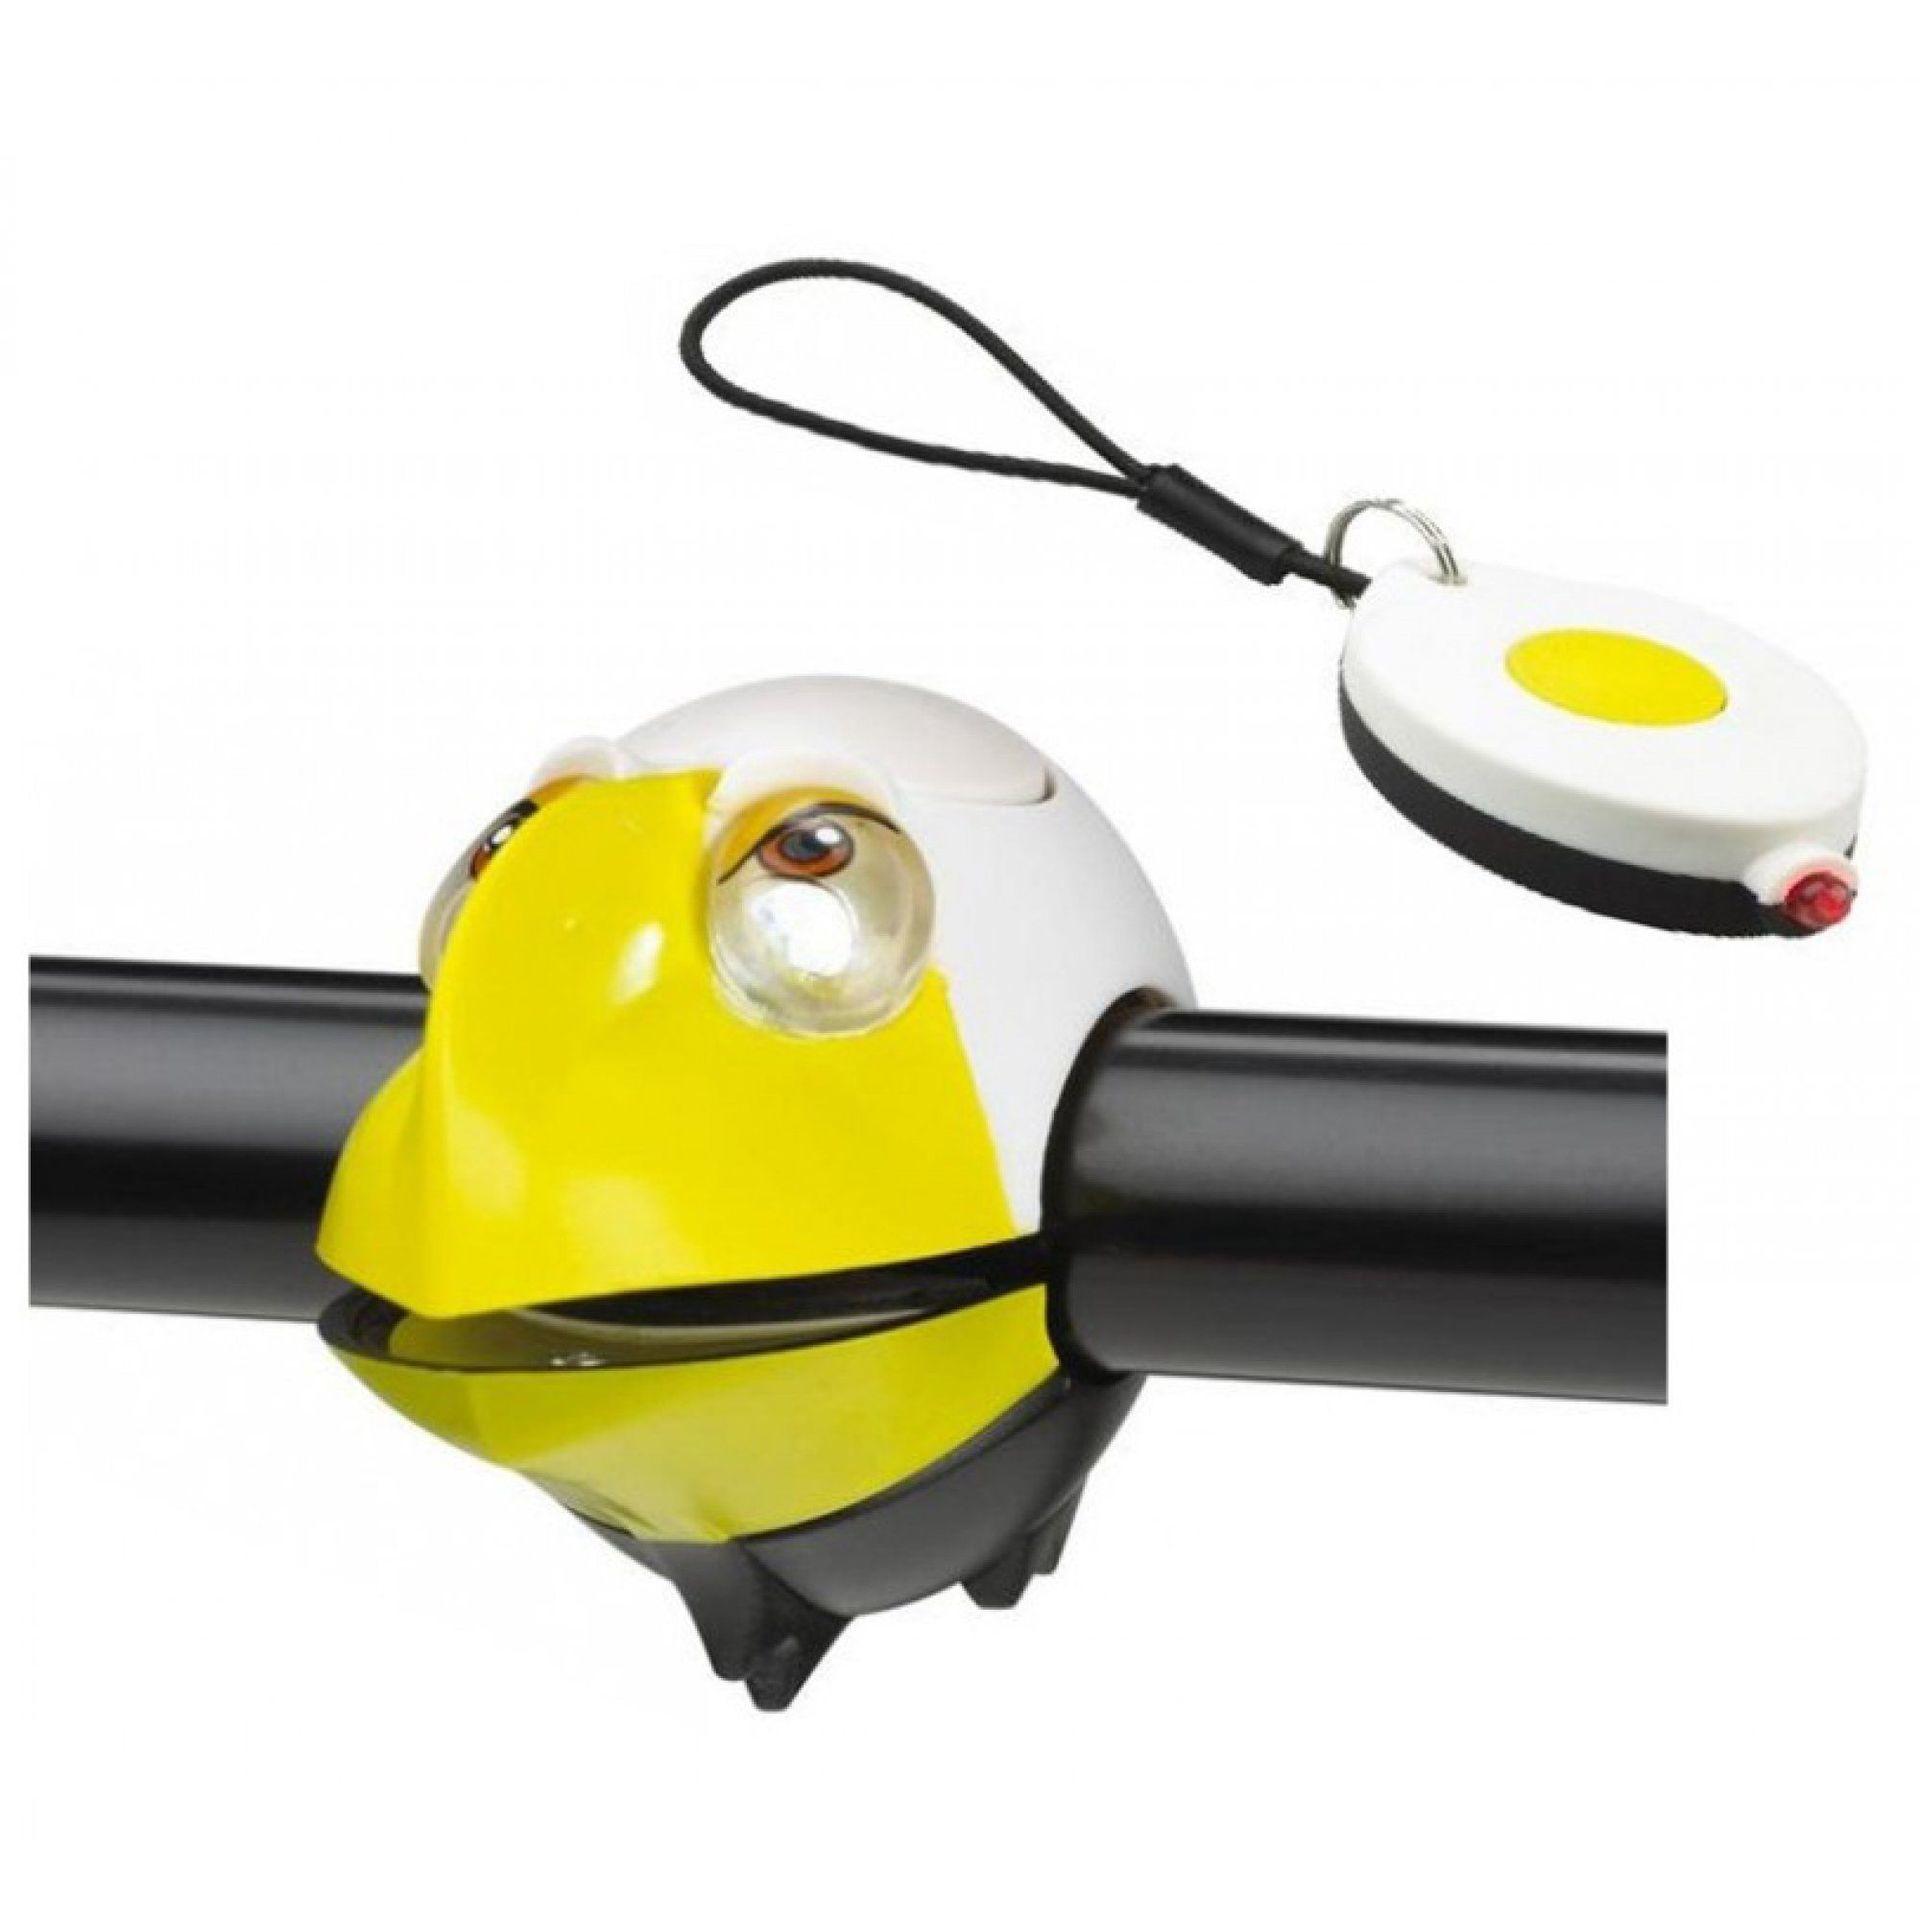 ZESTAW LAMPEK ROWEROWYCH CRAZY SAFETY EAGLE